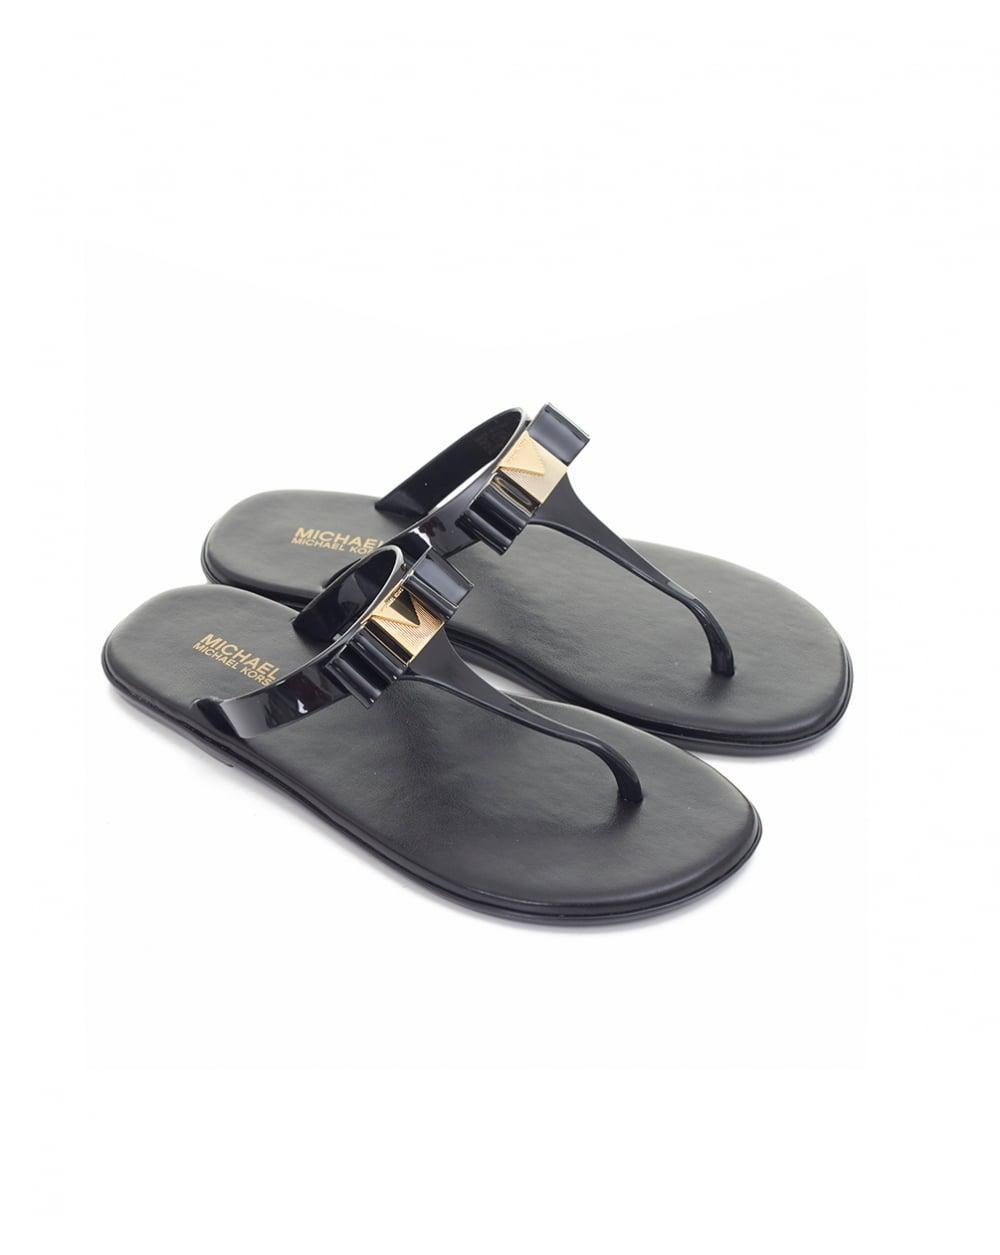 7727301d8a Lyst - Michael Kors Caroline Jelly Thong Sandals in Black